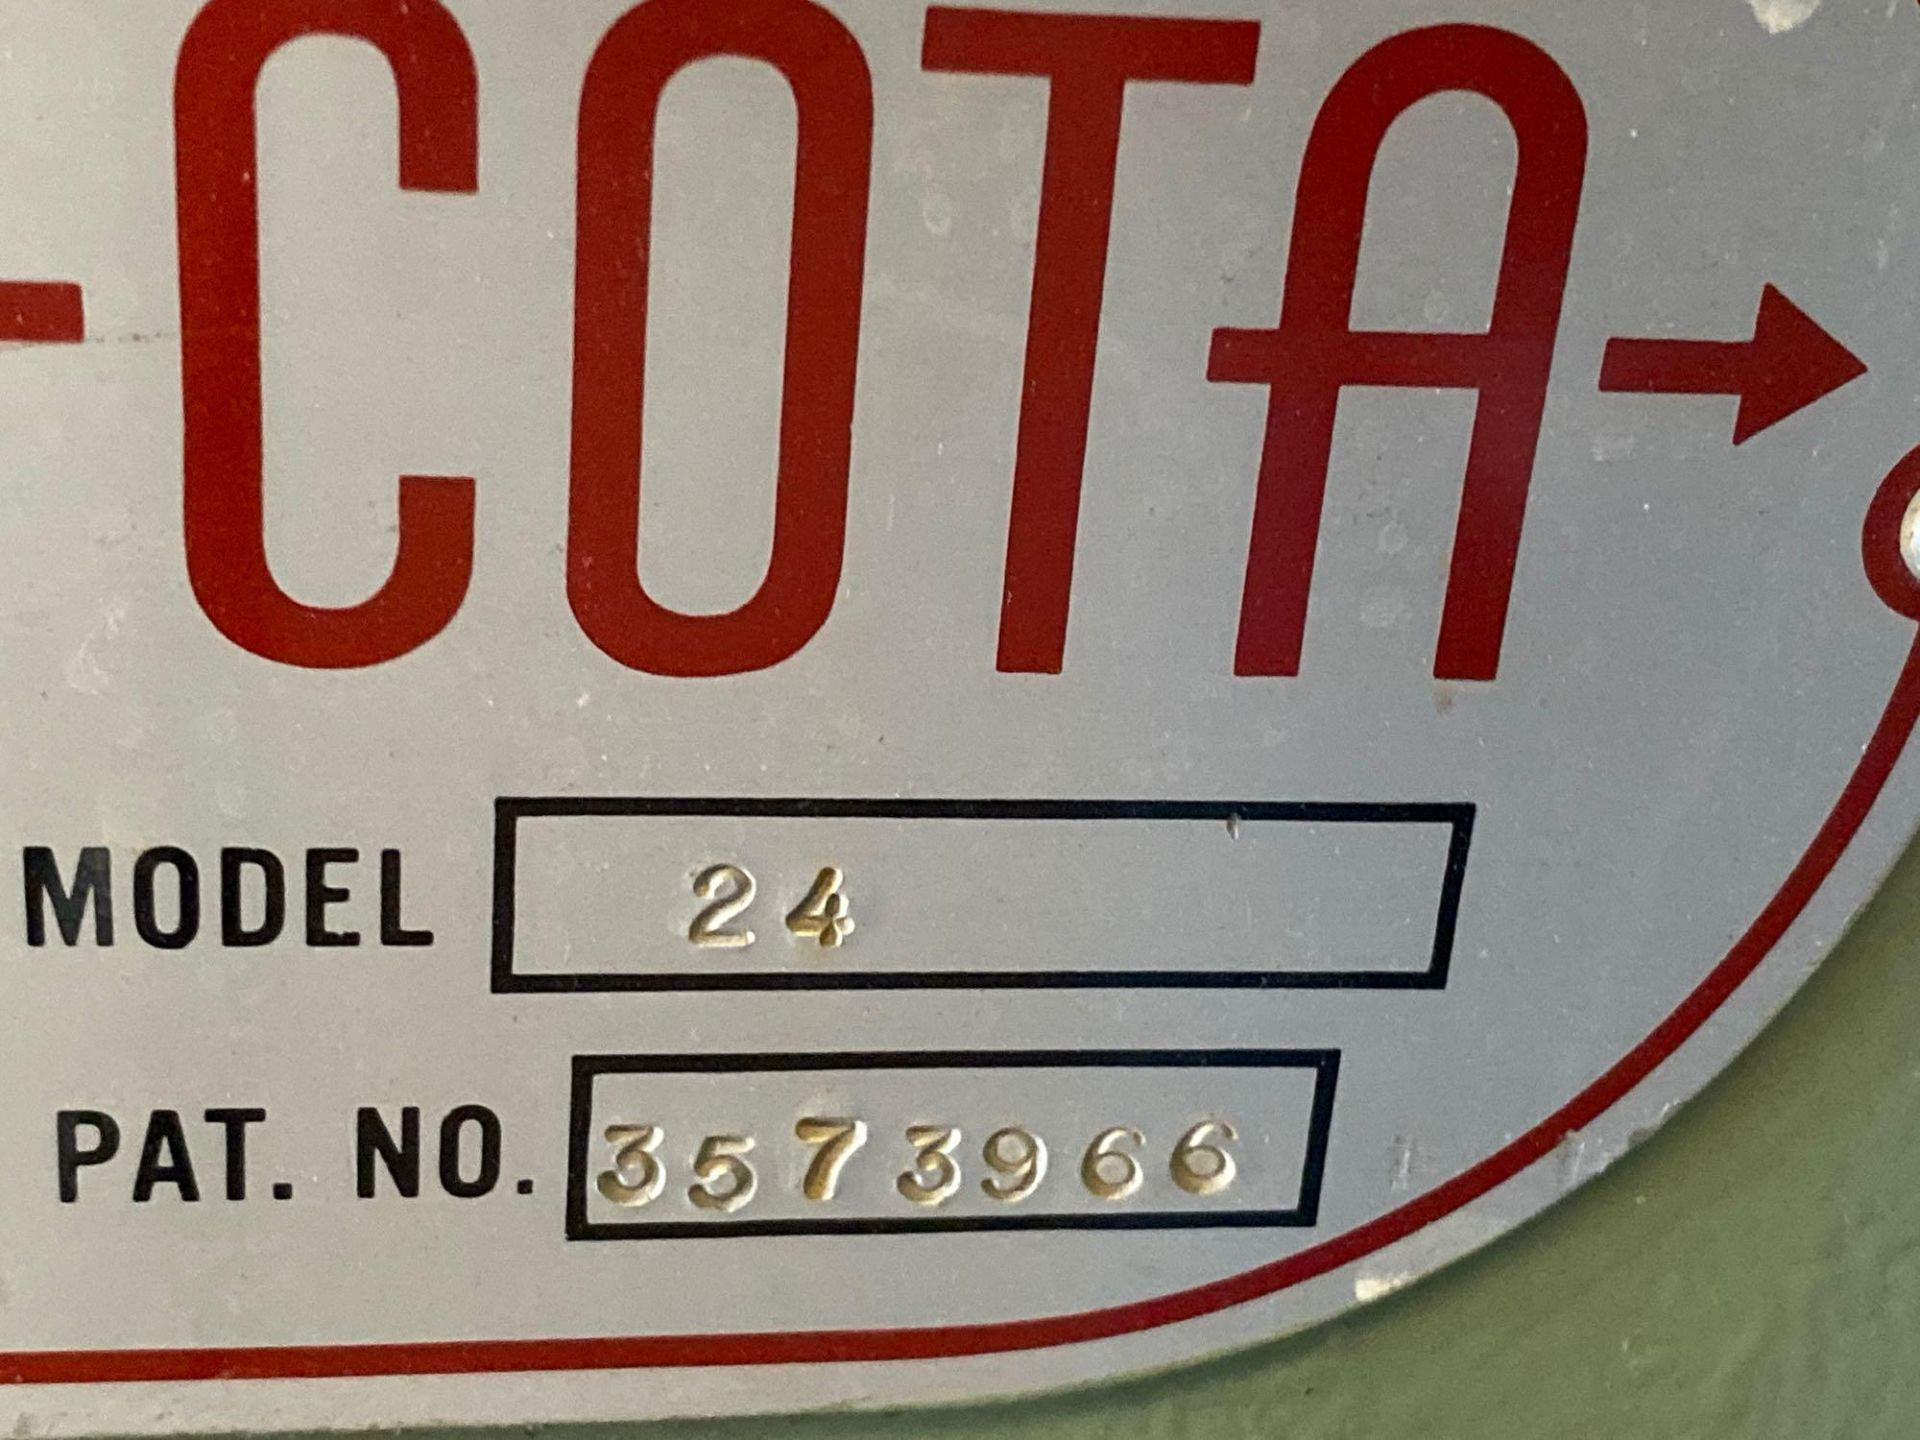 Accela-Cota Tablet Coater - Image 10 of 11